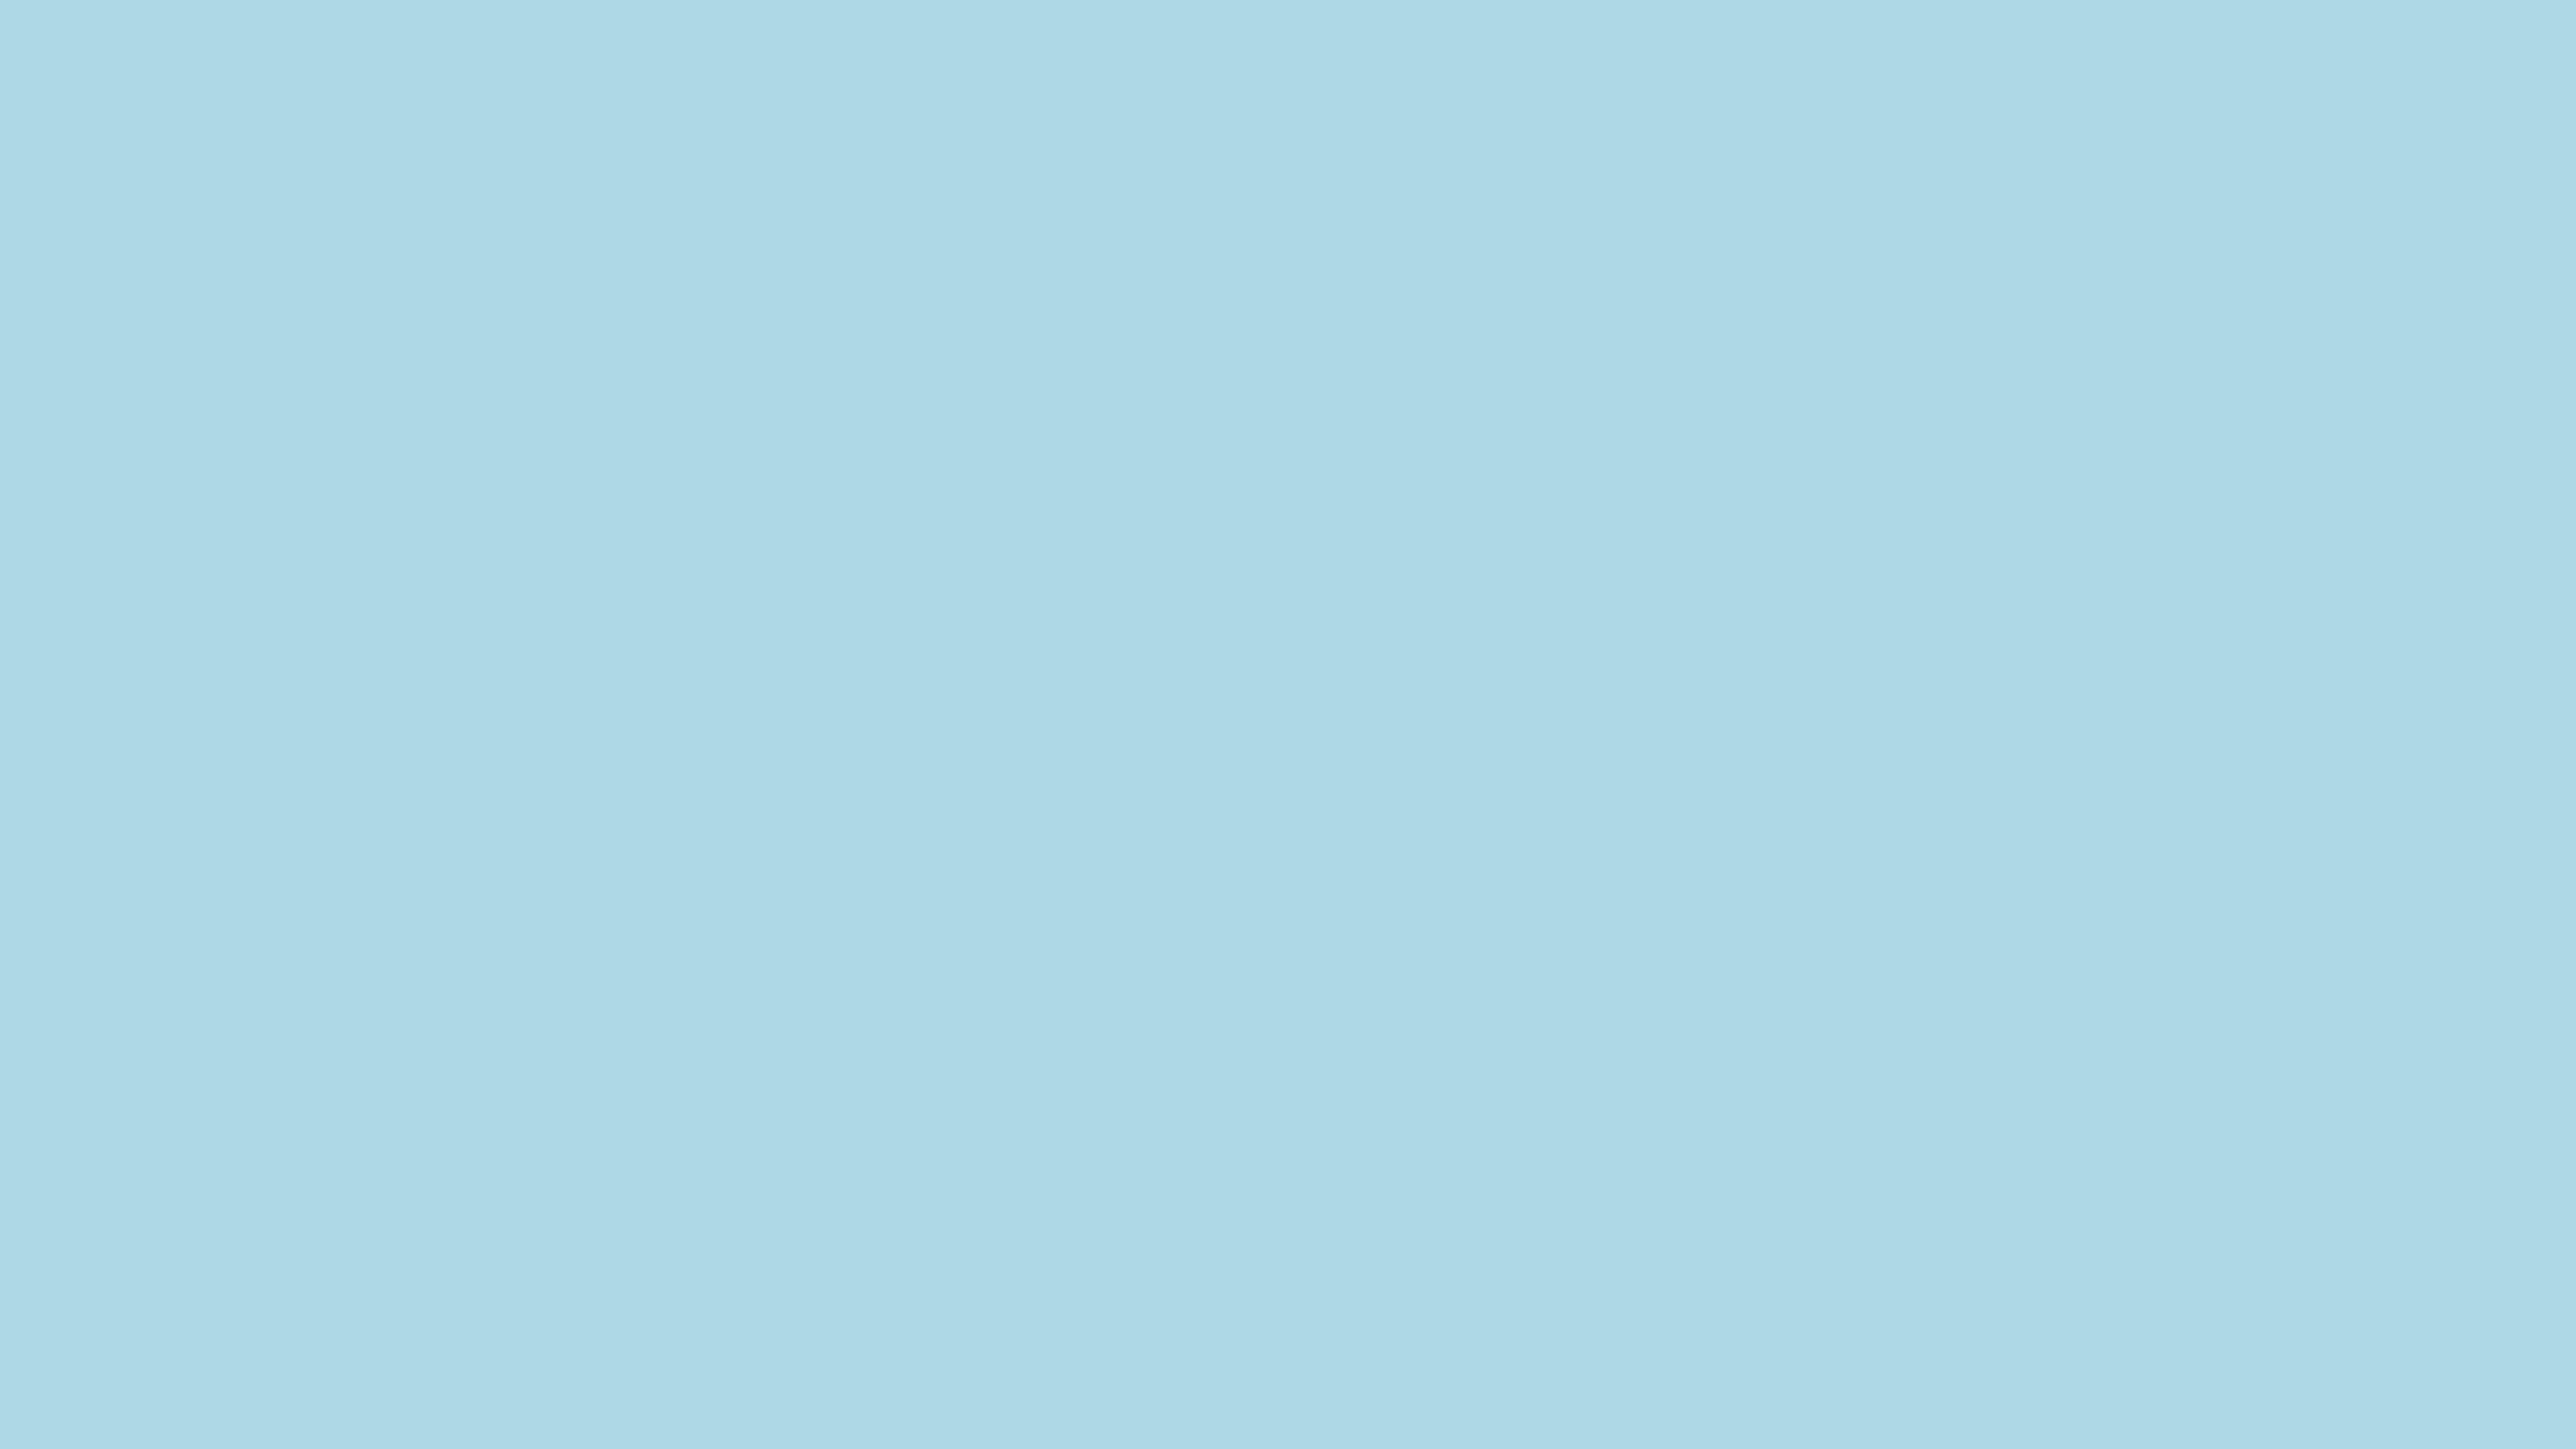 3840x2160 Light Blue Solid Color Background